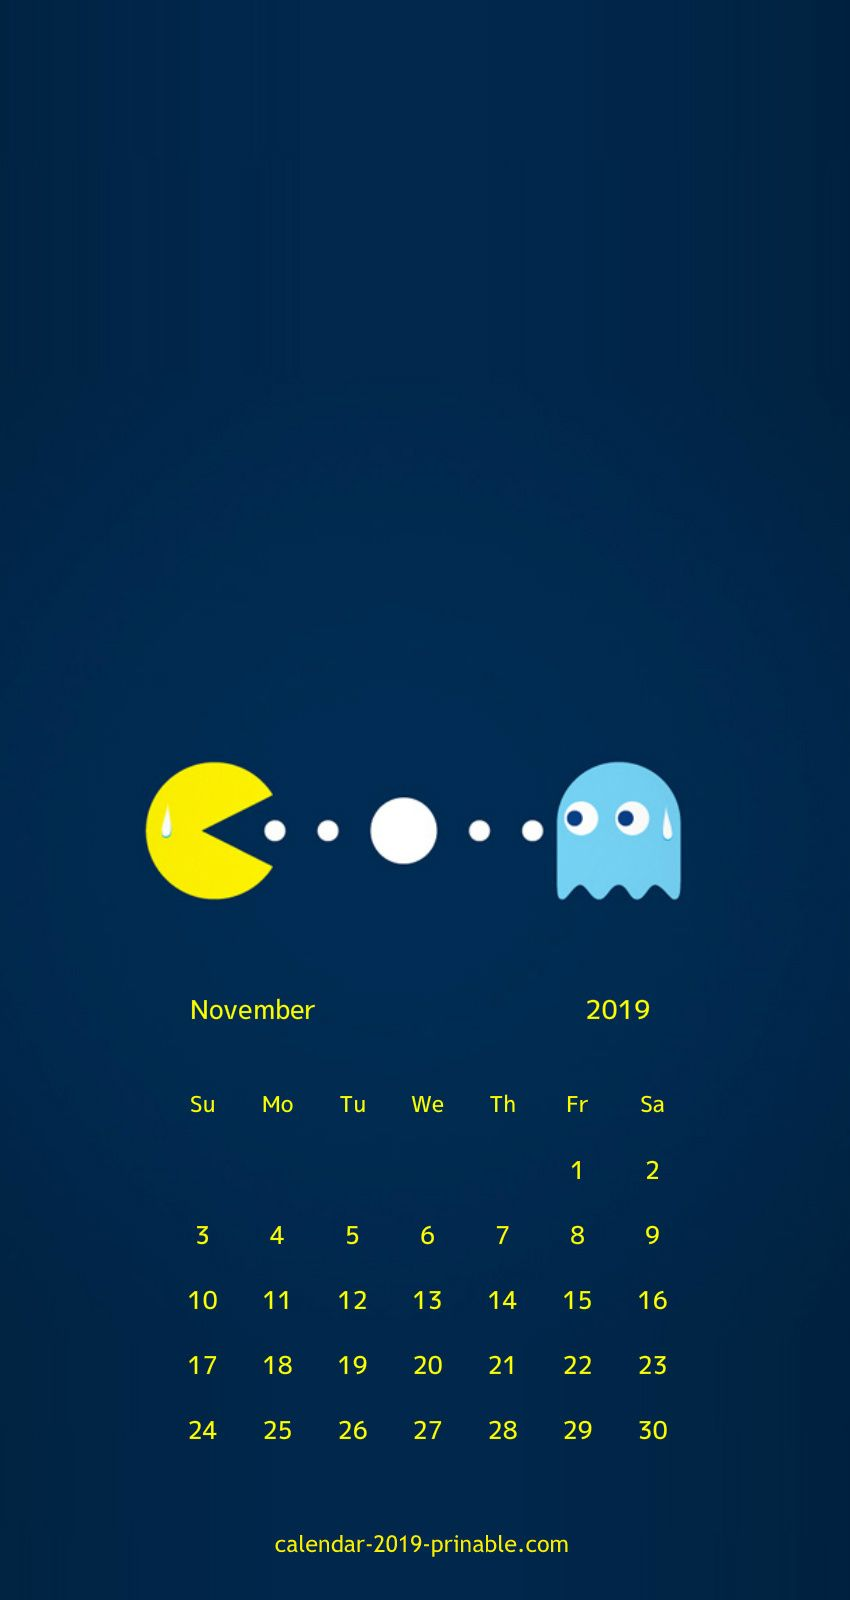 November 2019 Iphone Calendar Wallpaper Calendar Wallpaper Wallpaper Wallpaper Iphone Quotes